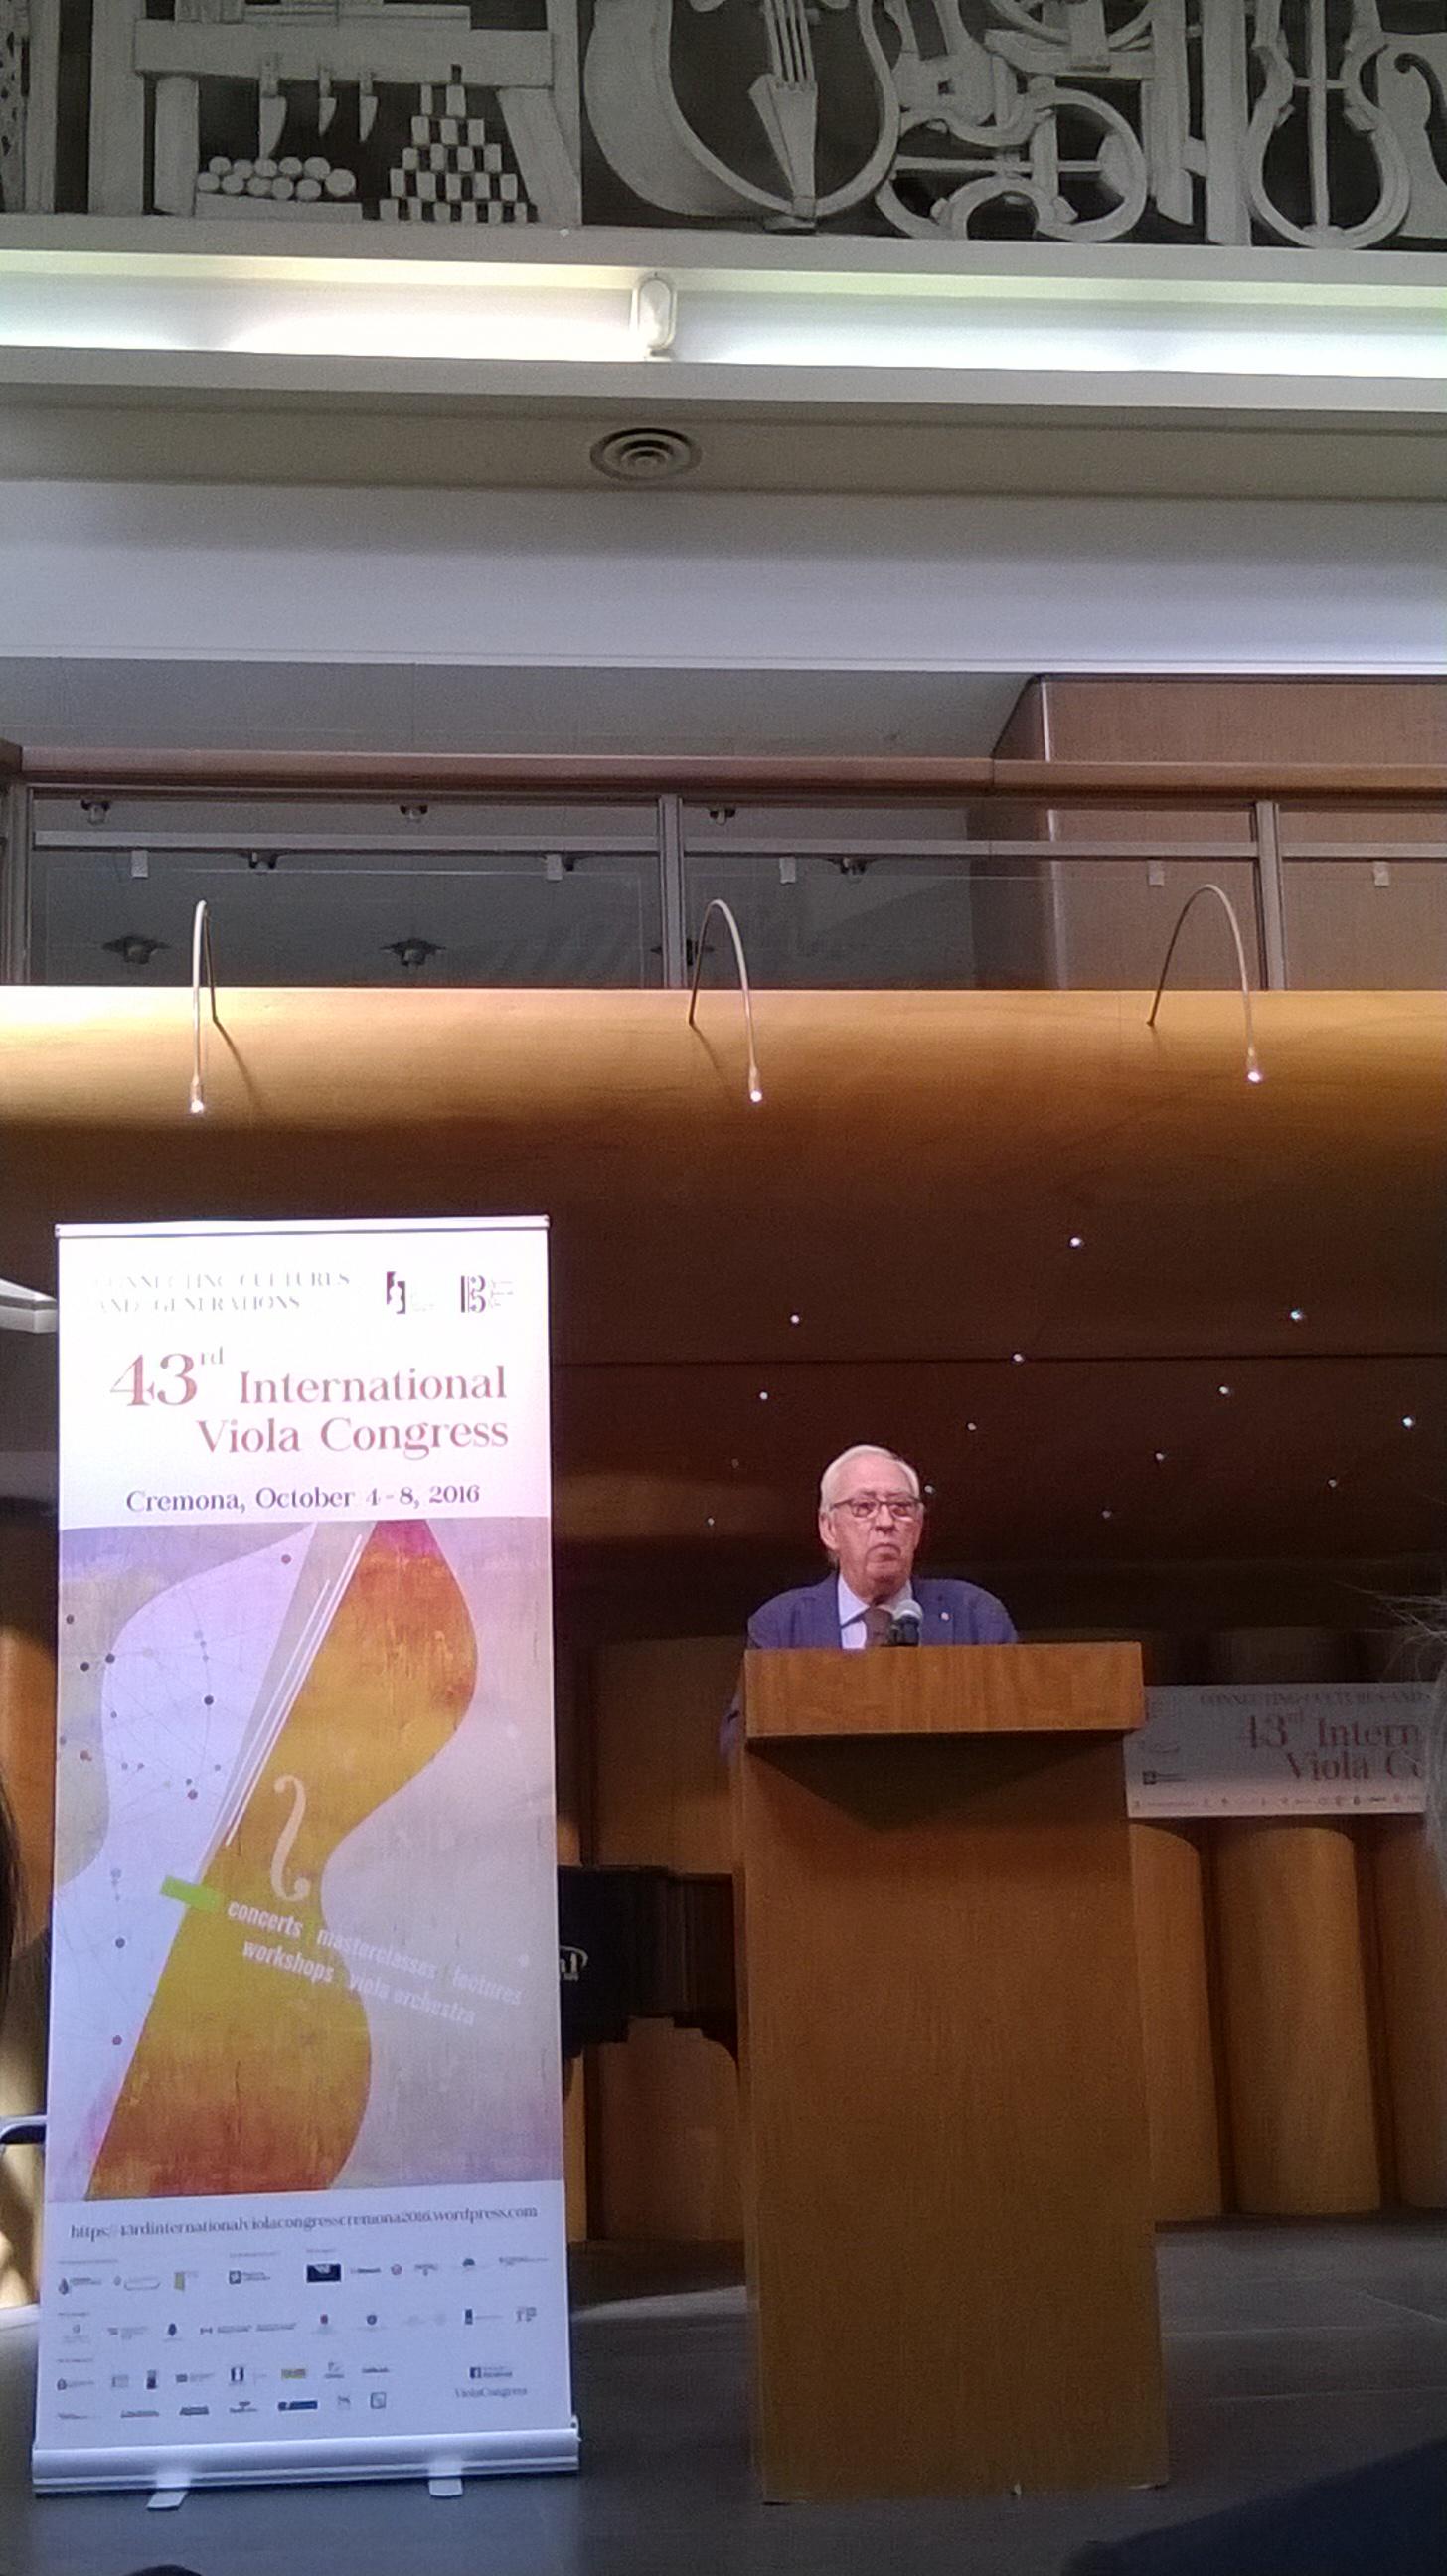 Maestro Bruno Giuranna opening the 43rd International Viola Congress in Cremona